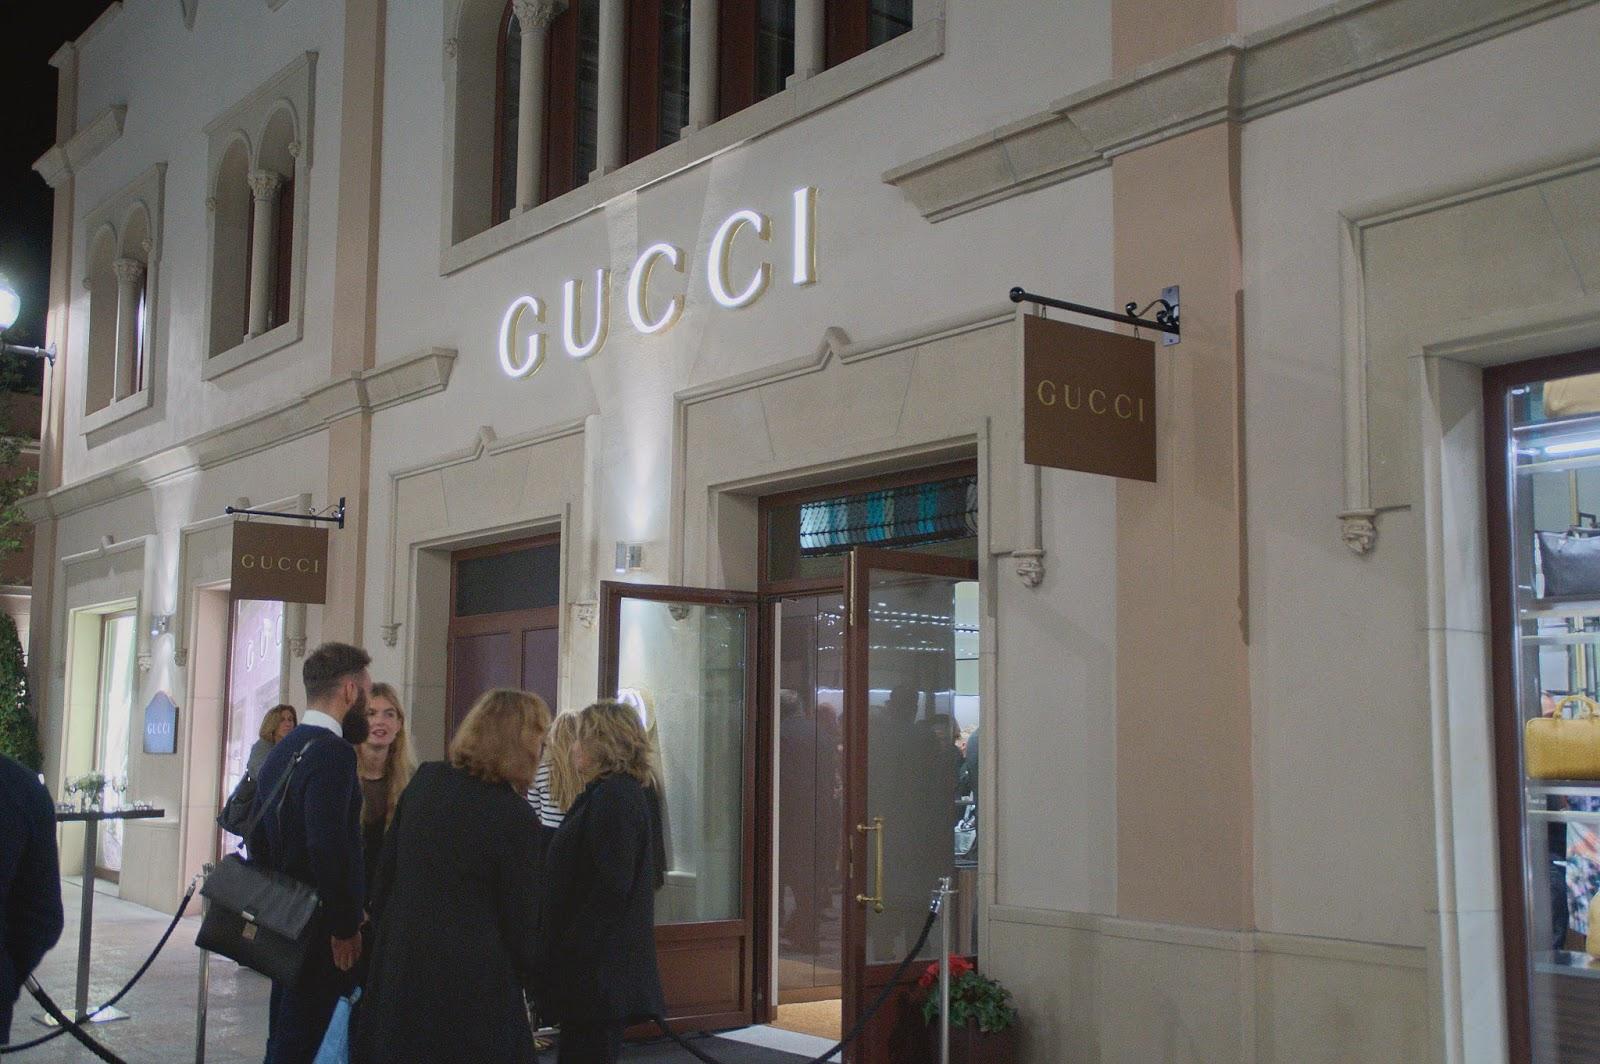 Gucci La Roca Village Barcelona